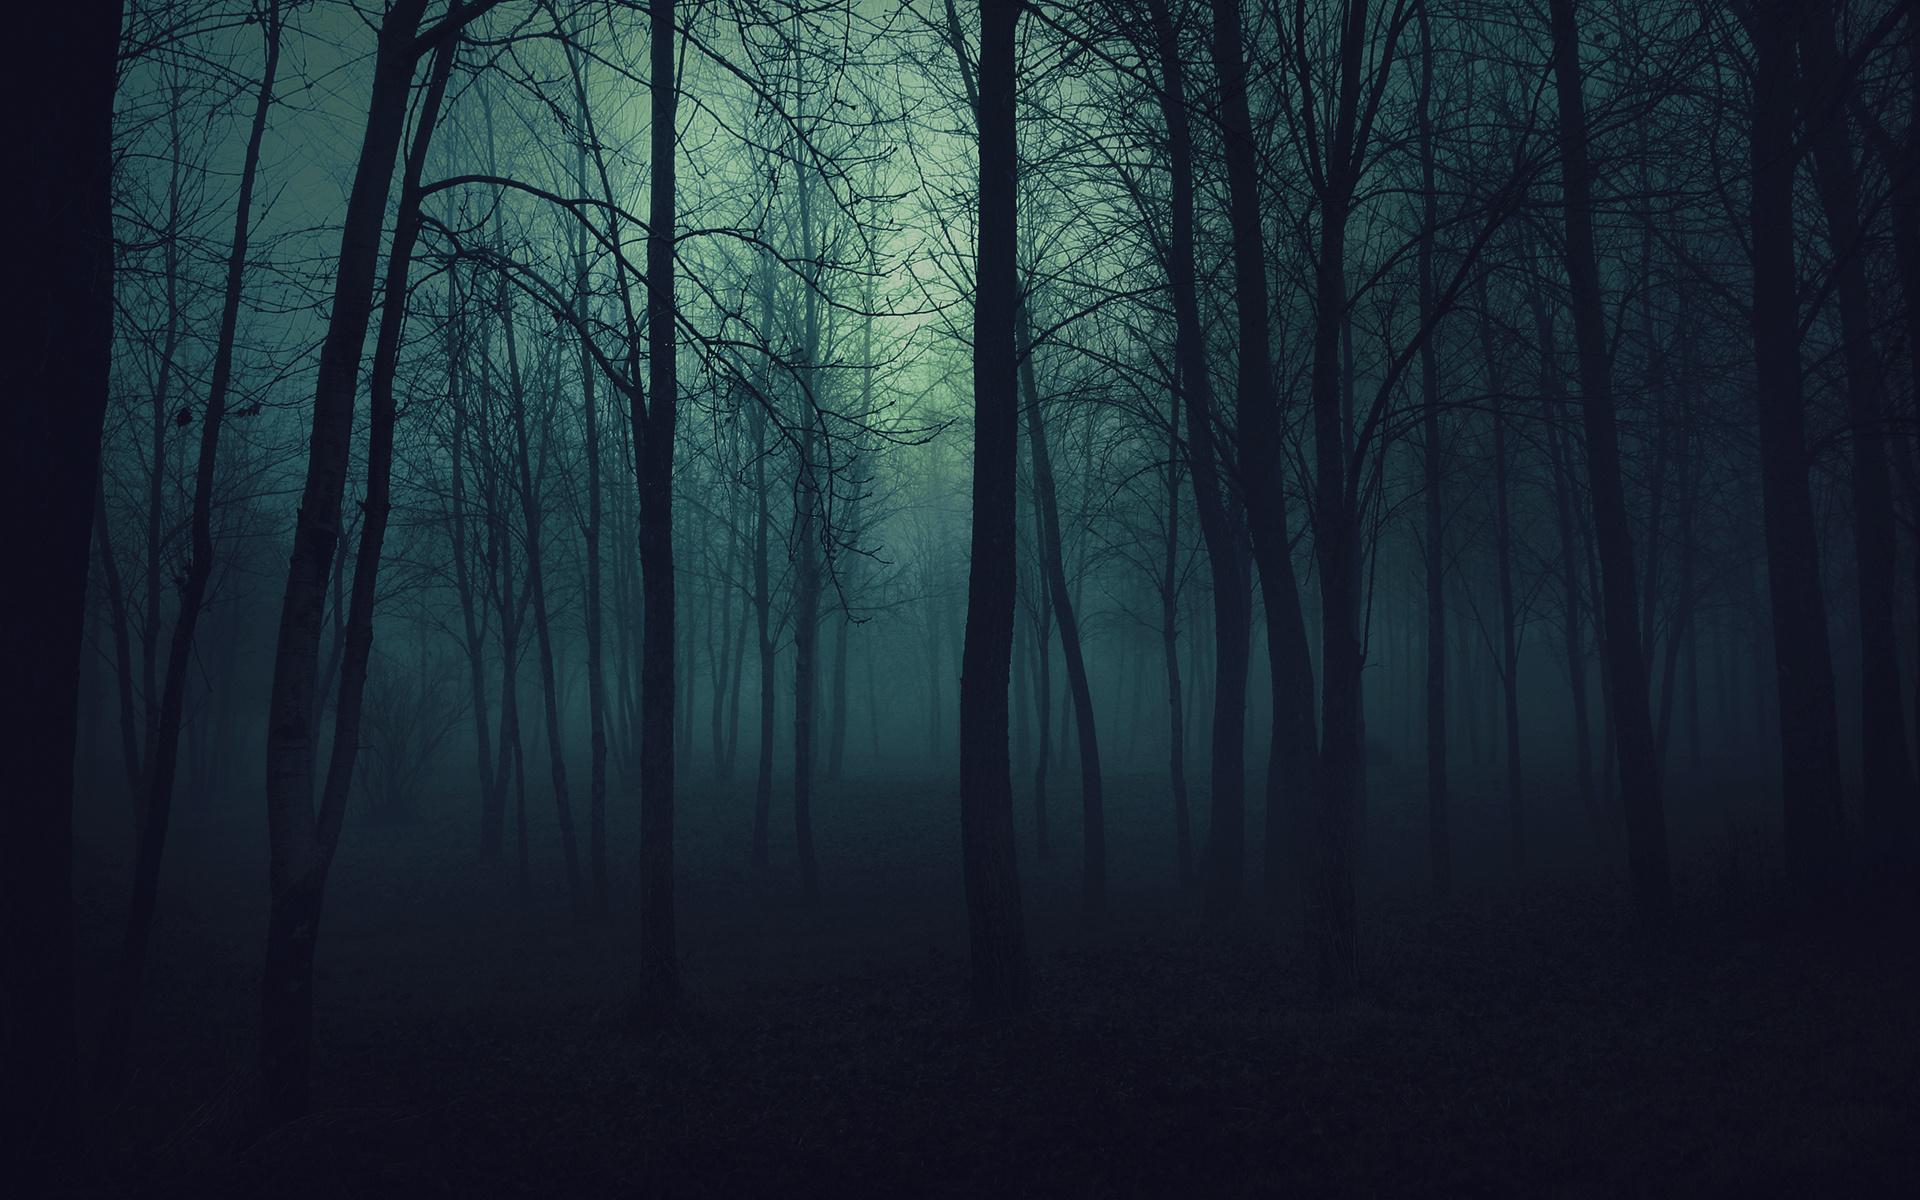 Haunted Tree Images, Stock Photos & Vectors   Shutterstock